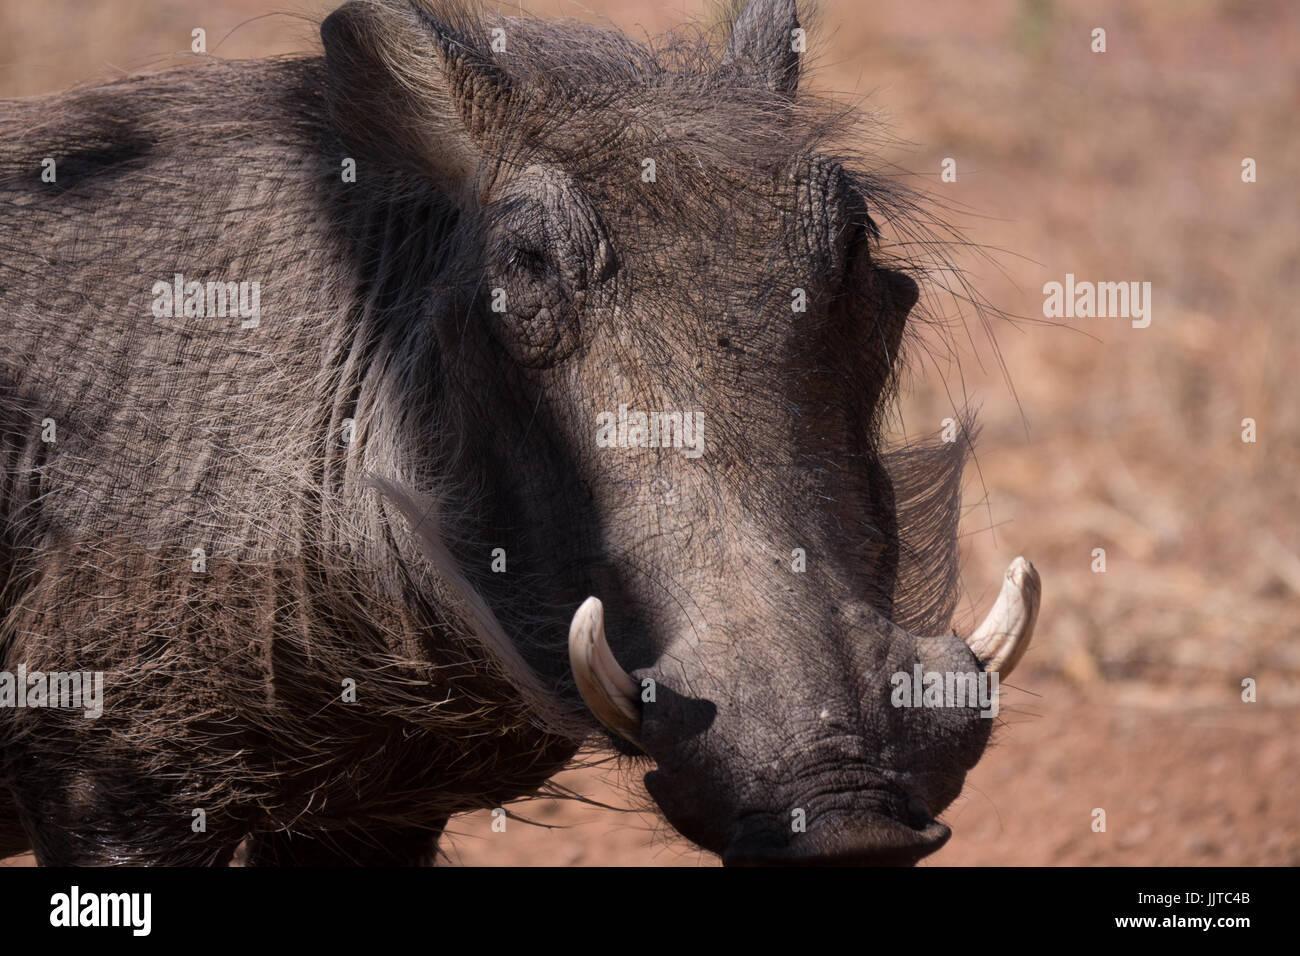 Warthog, Phacochoerus (sp), in Namibia, Africa - Stock Image